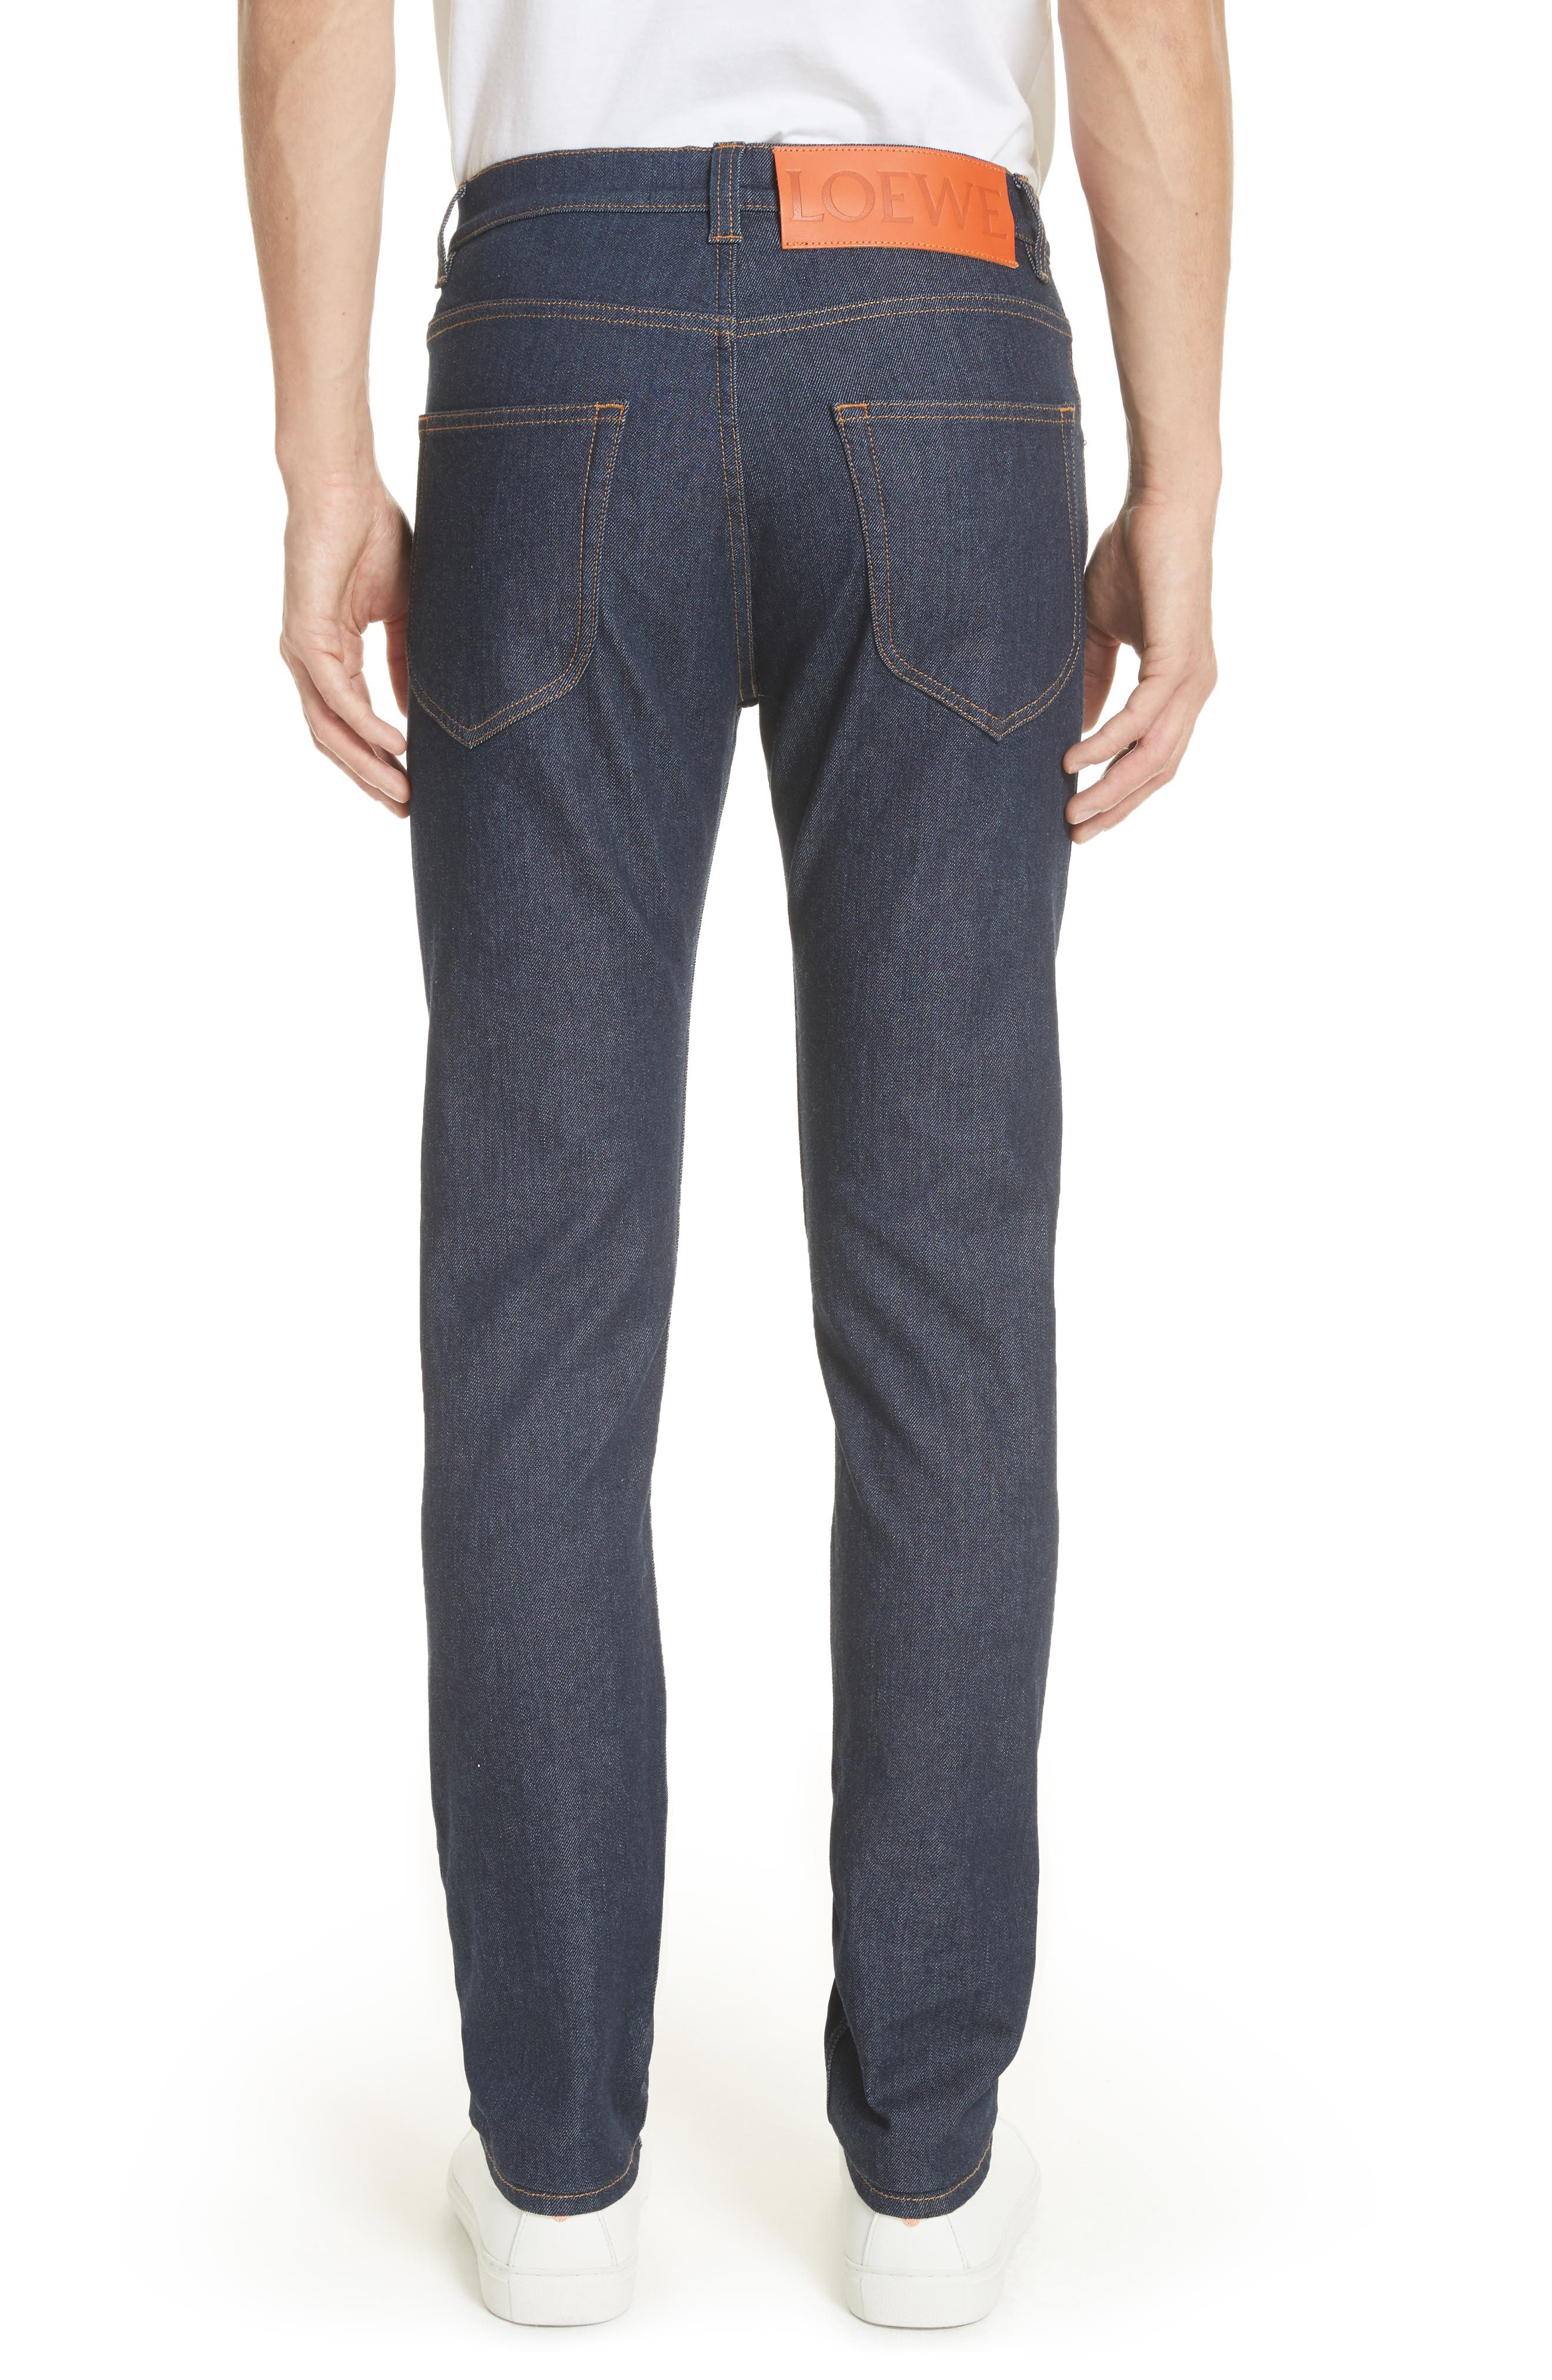 Skinny Fit Jeans,                             Alternate thumbnail 2, color,                             491